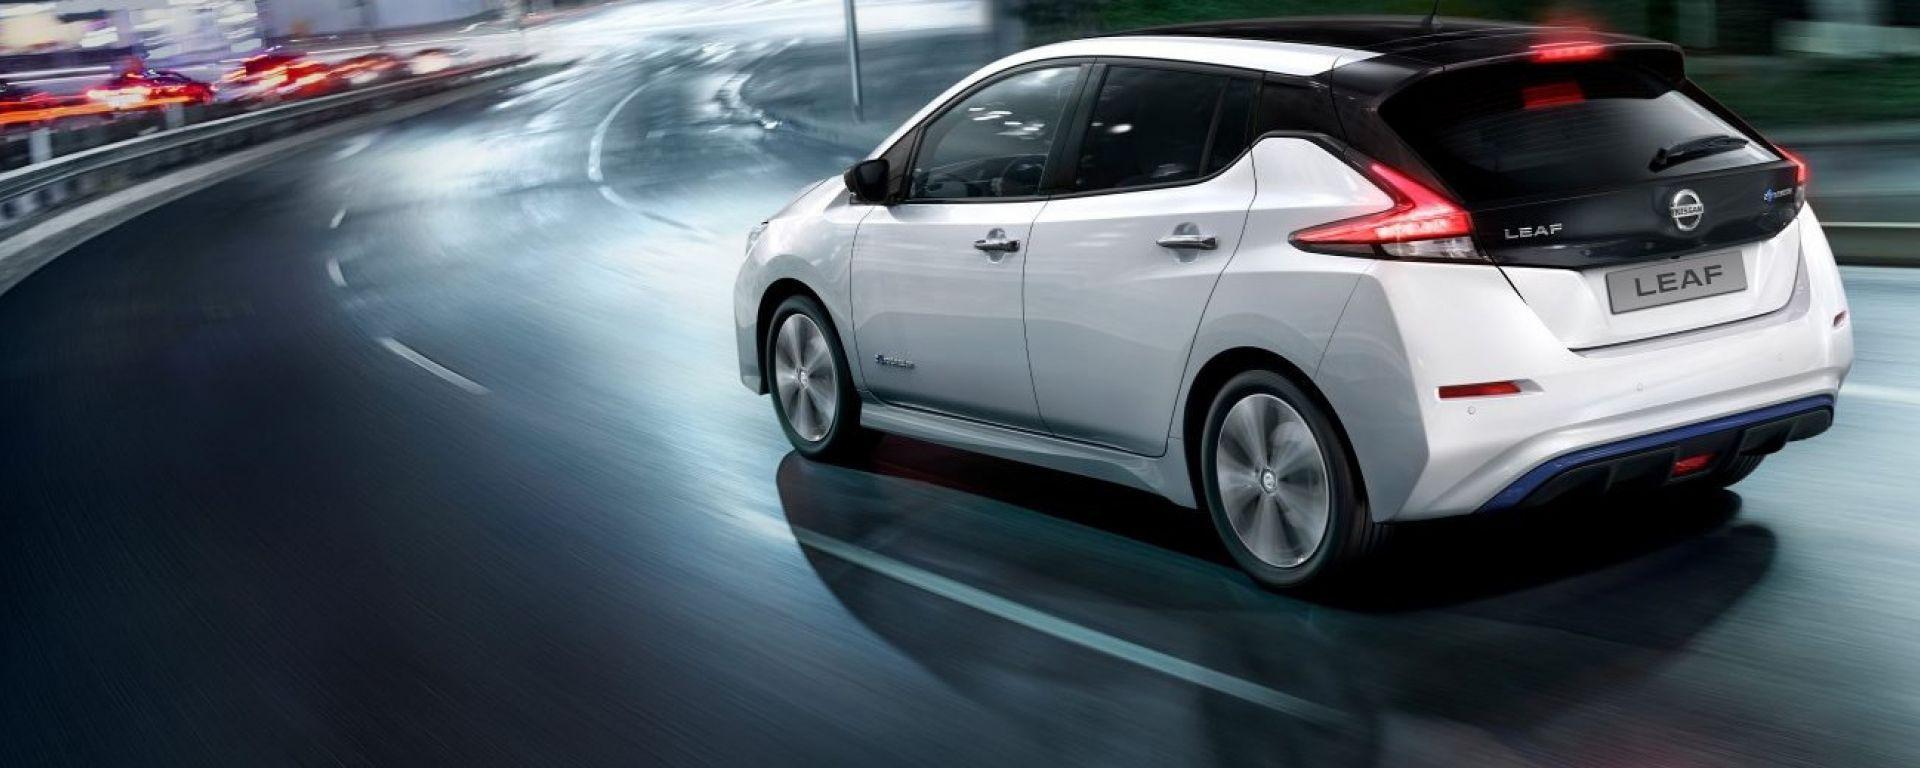 Nissan Leaf, perché non comprarla usata?